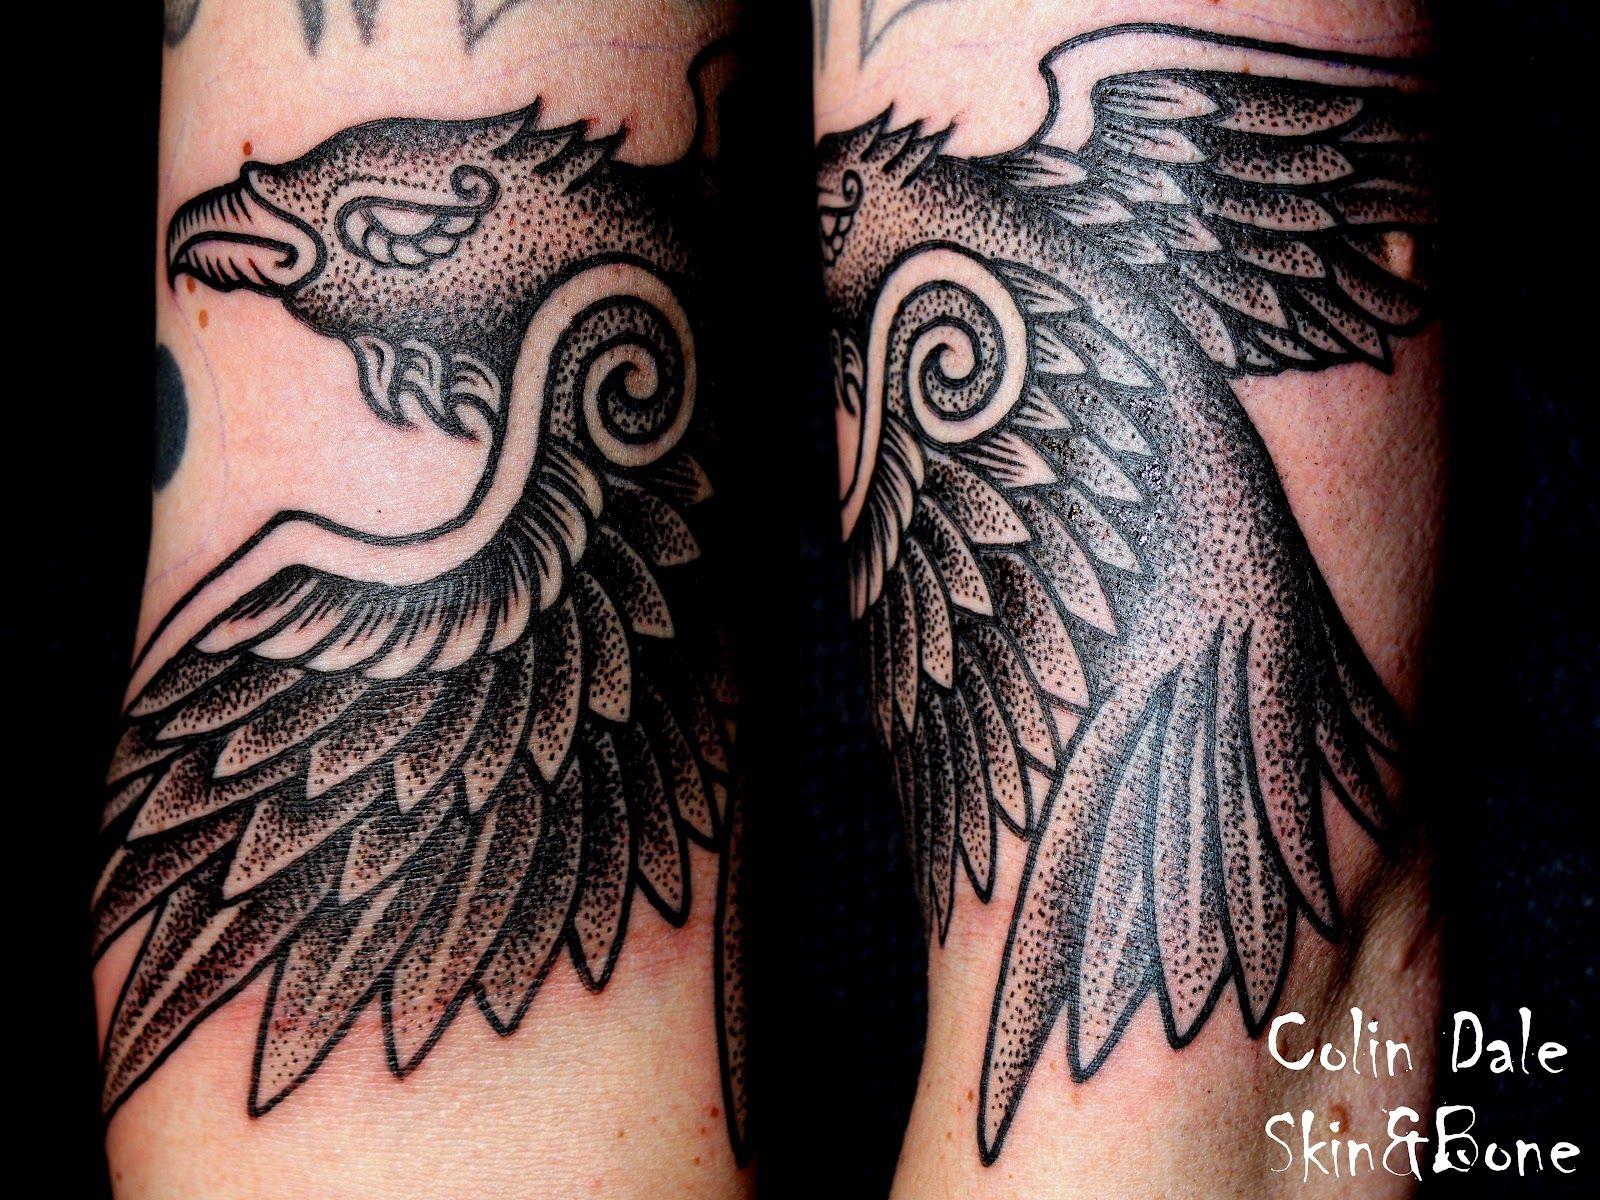 Raven Viking Tattoo: Nordic Raven Tattoo A One Shot Raven